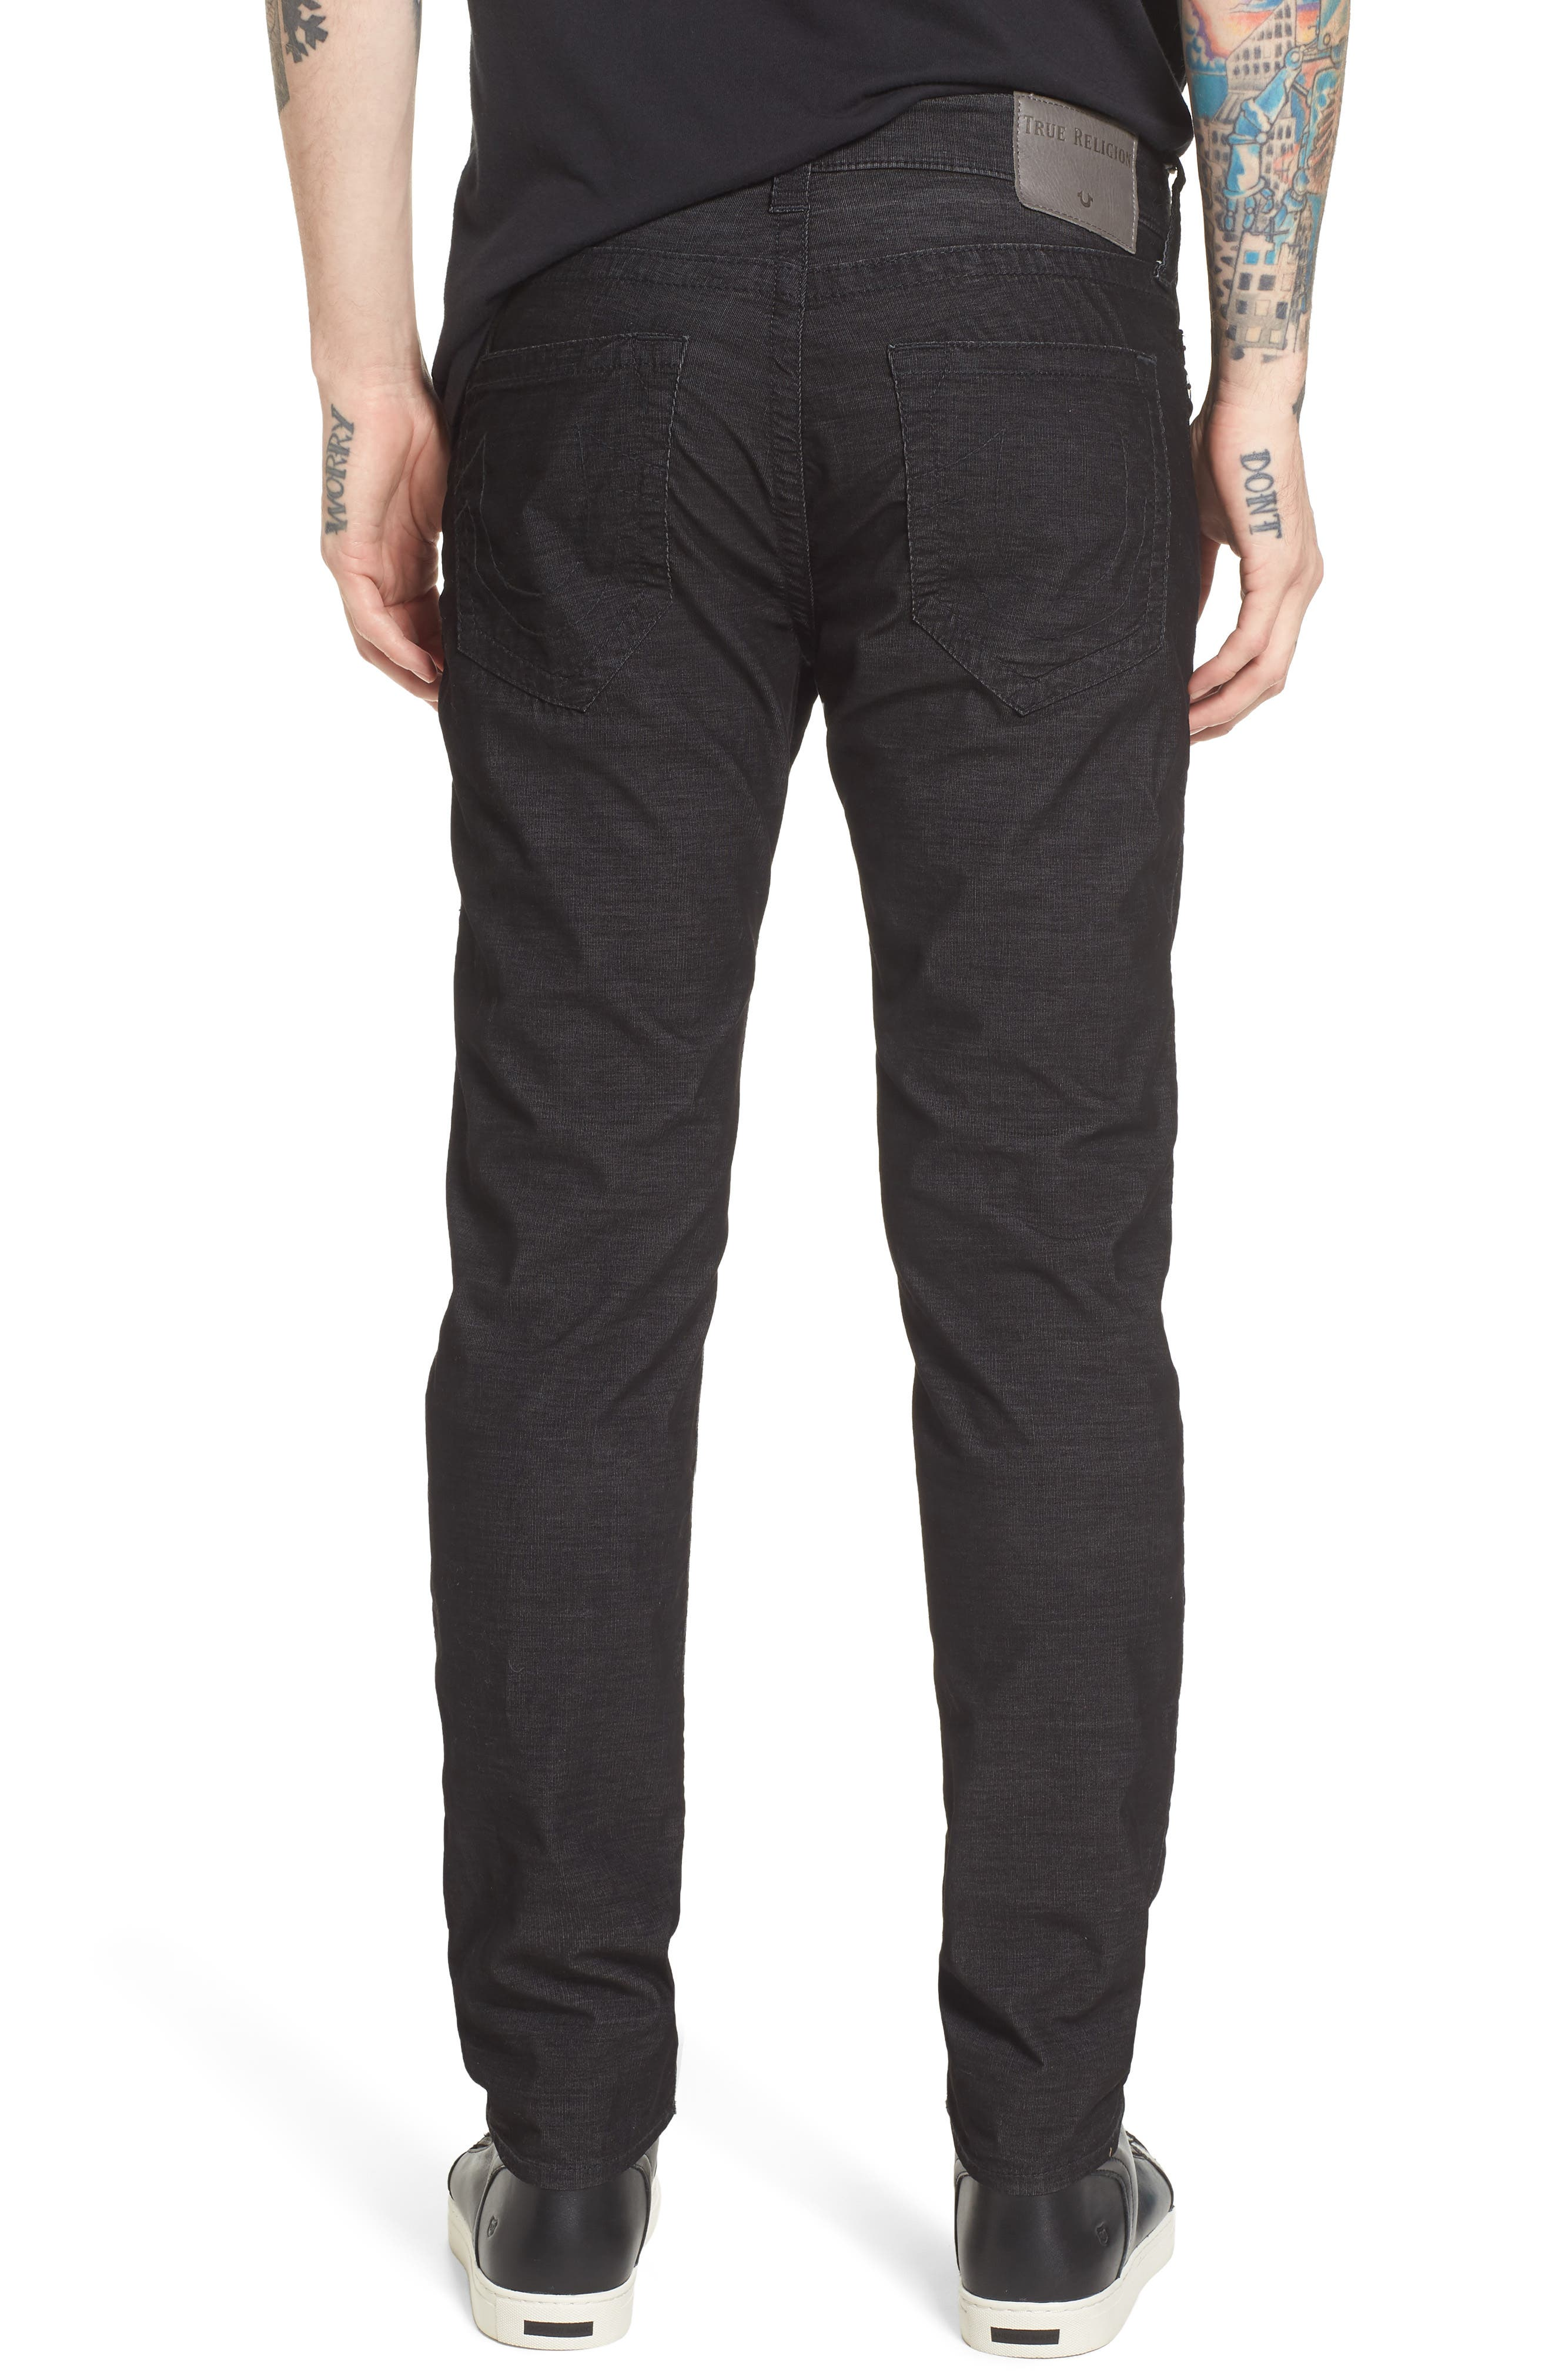 Rocco Skinny Fit Corduroy Jeans,                             Alternate thumbnail 2, color,                             Black